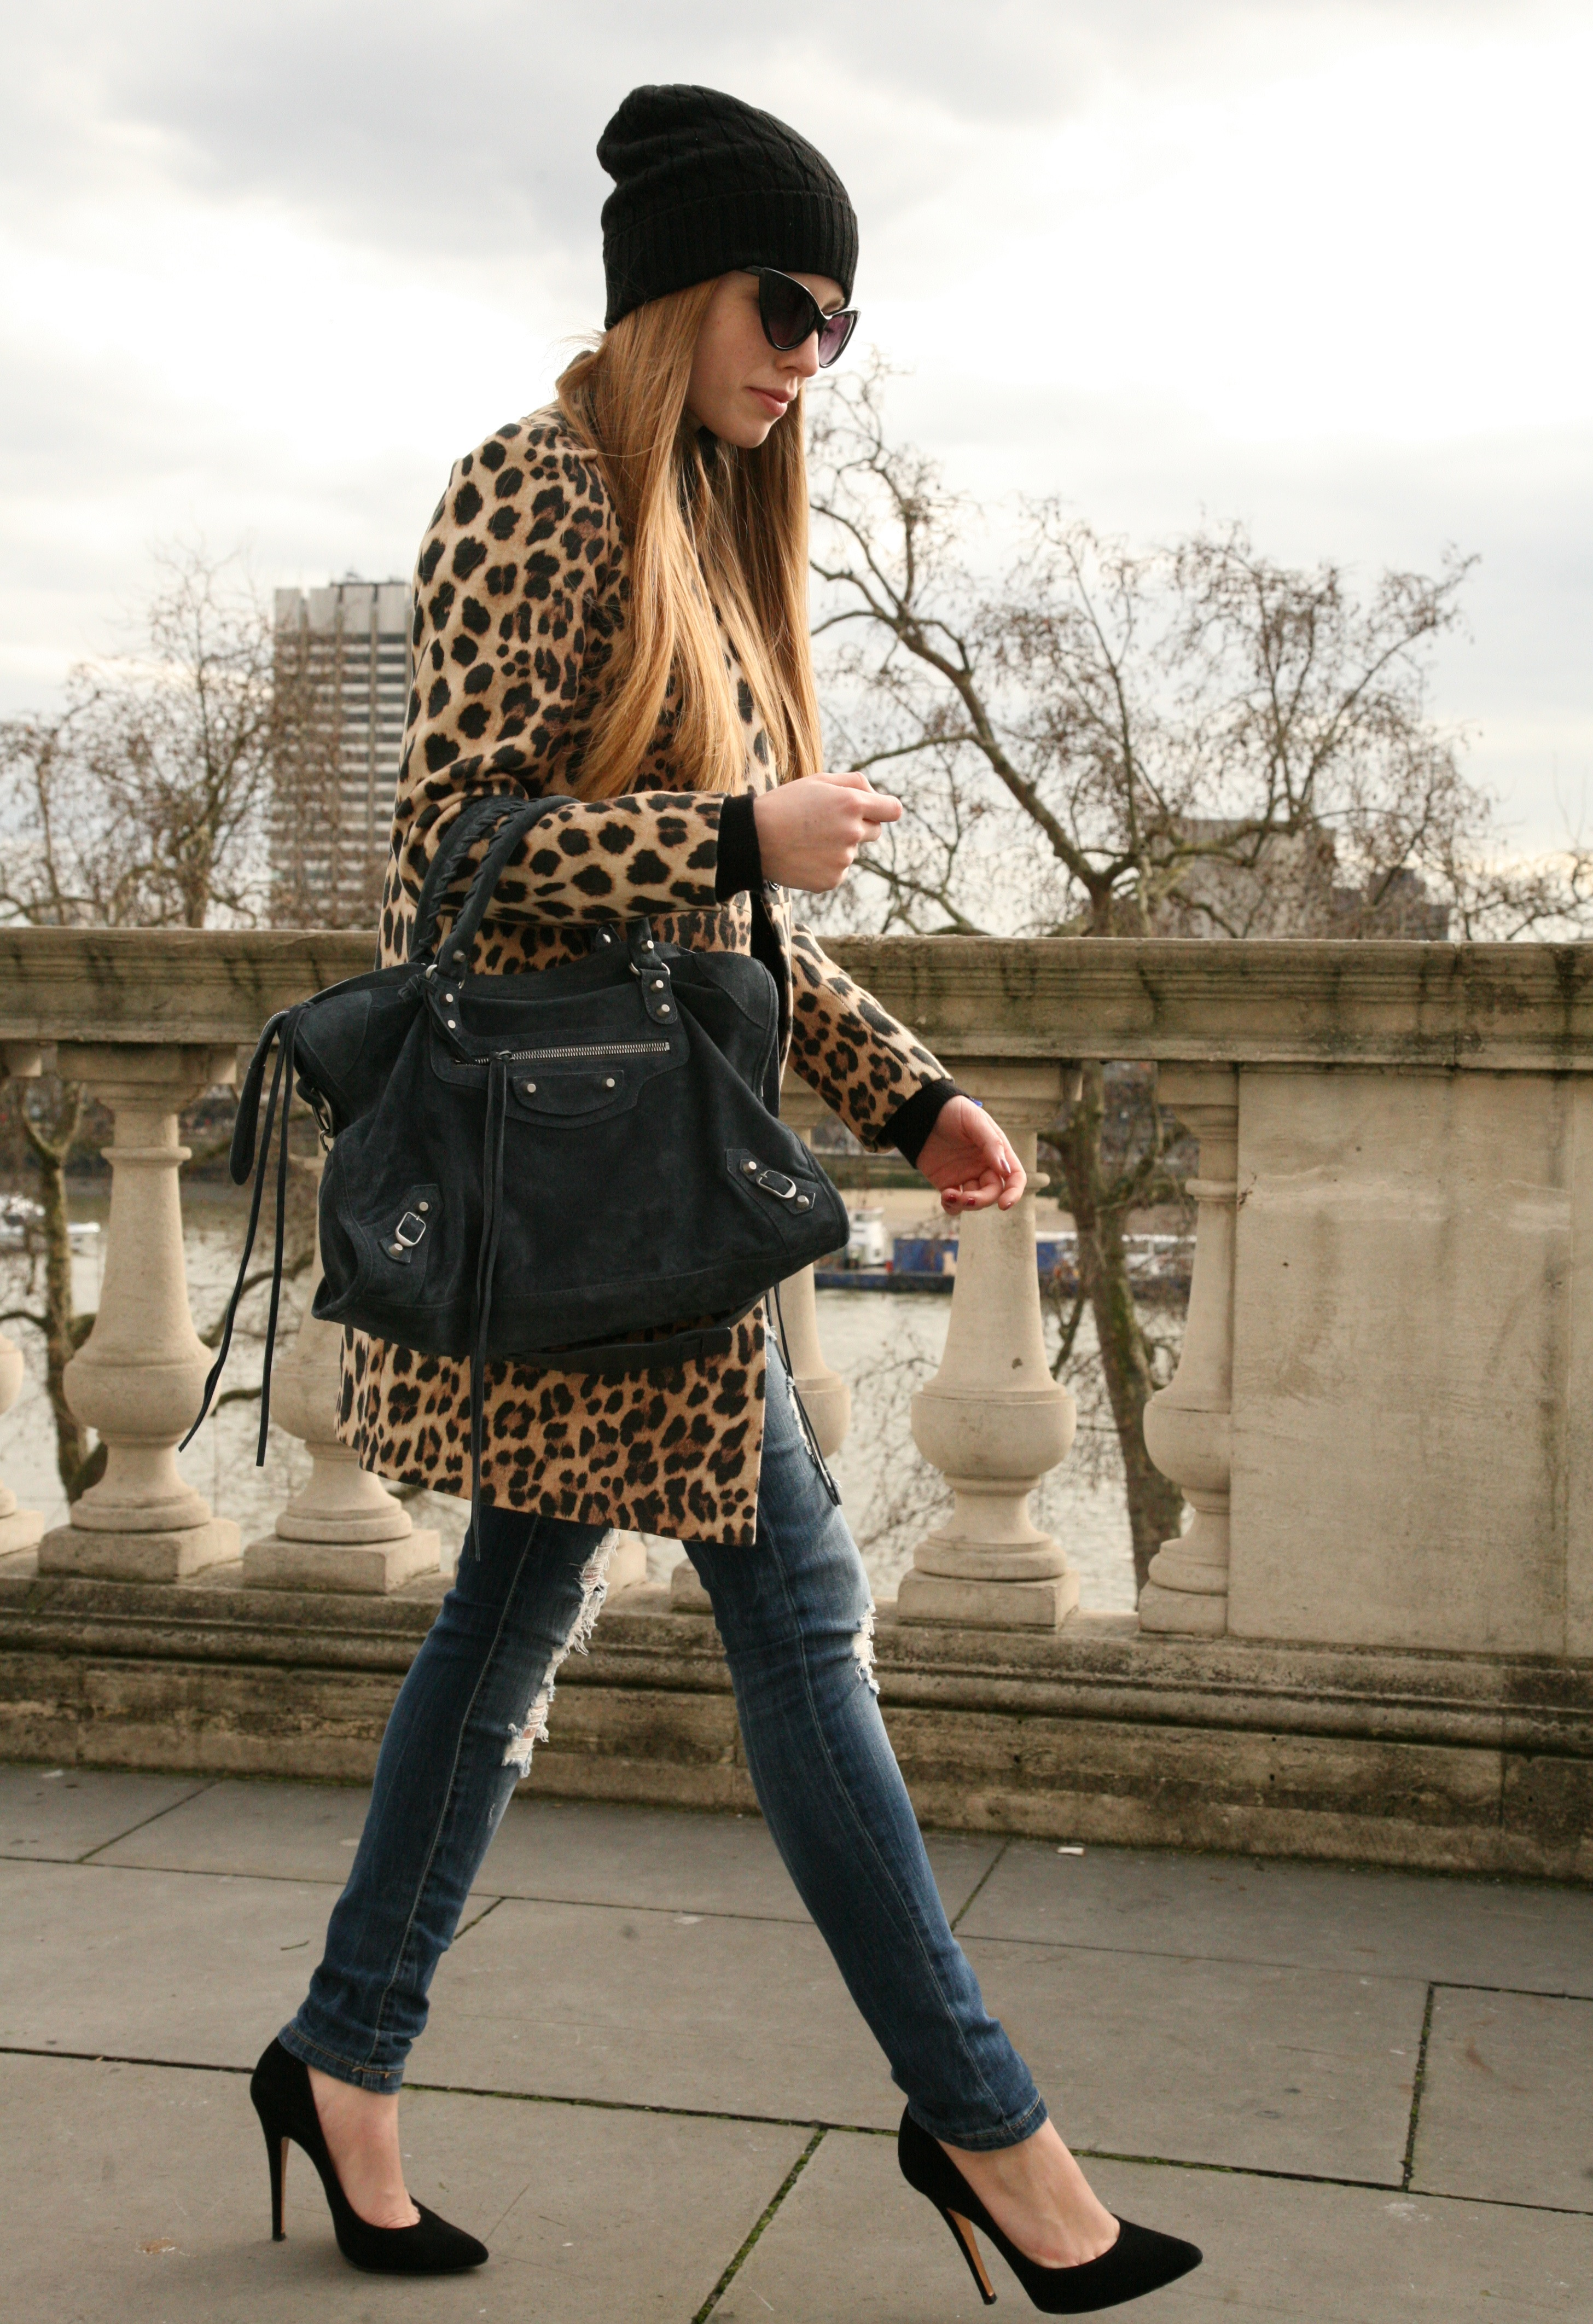 65815c921d6 London Fashion Week AW 13  Day 2